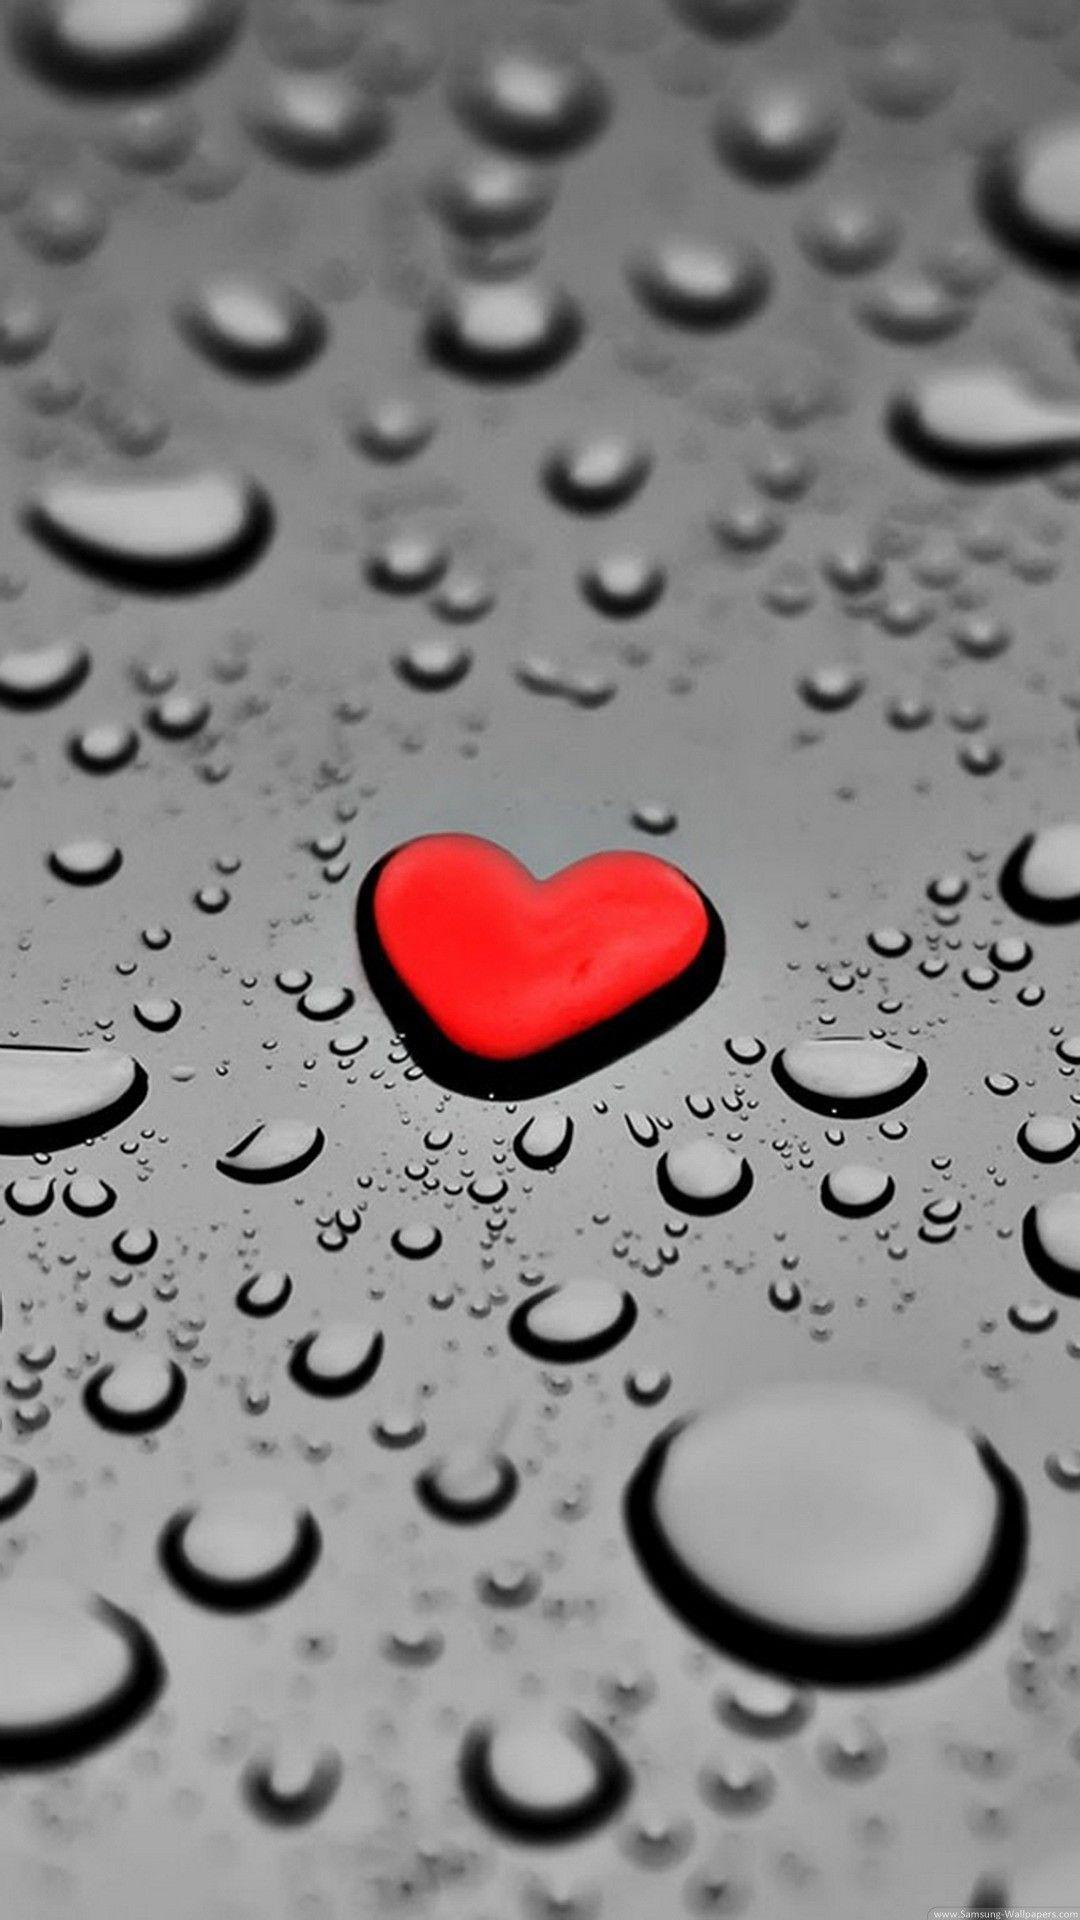 Hd Love Wallpaper For Mobile All Wallpapers Pinterest Wallpaper